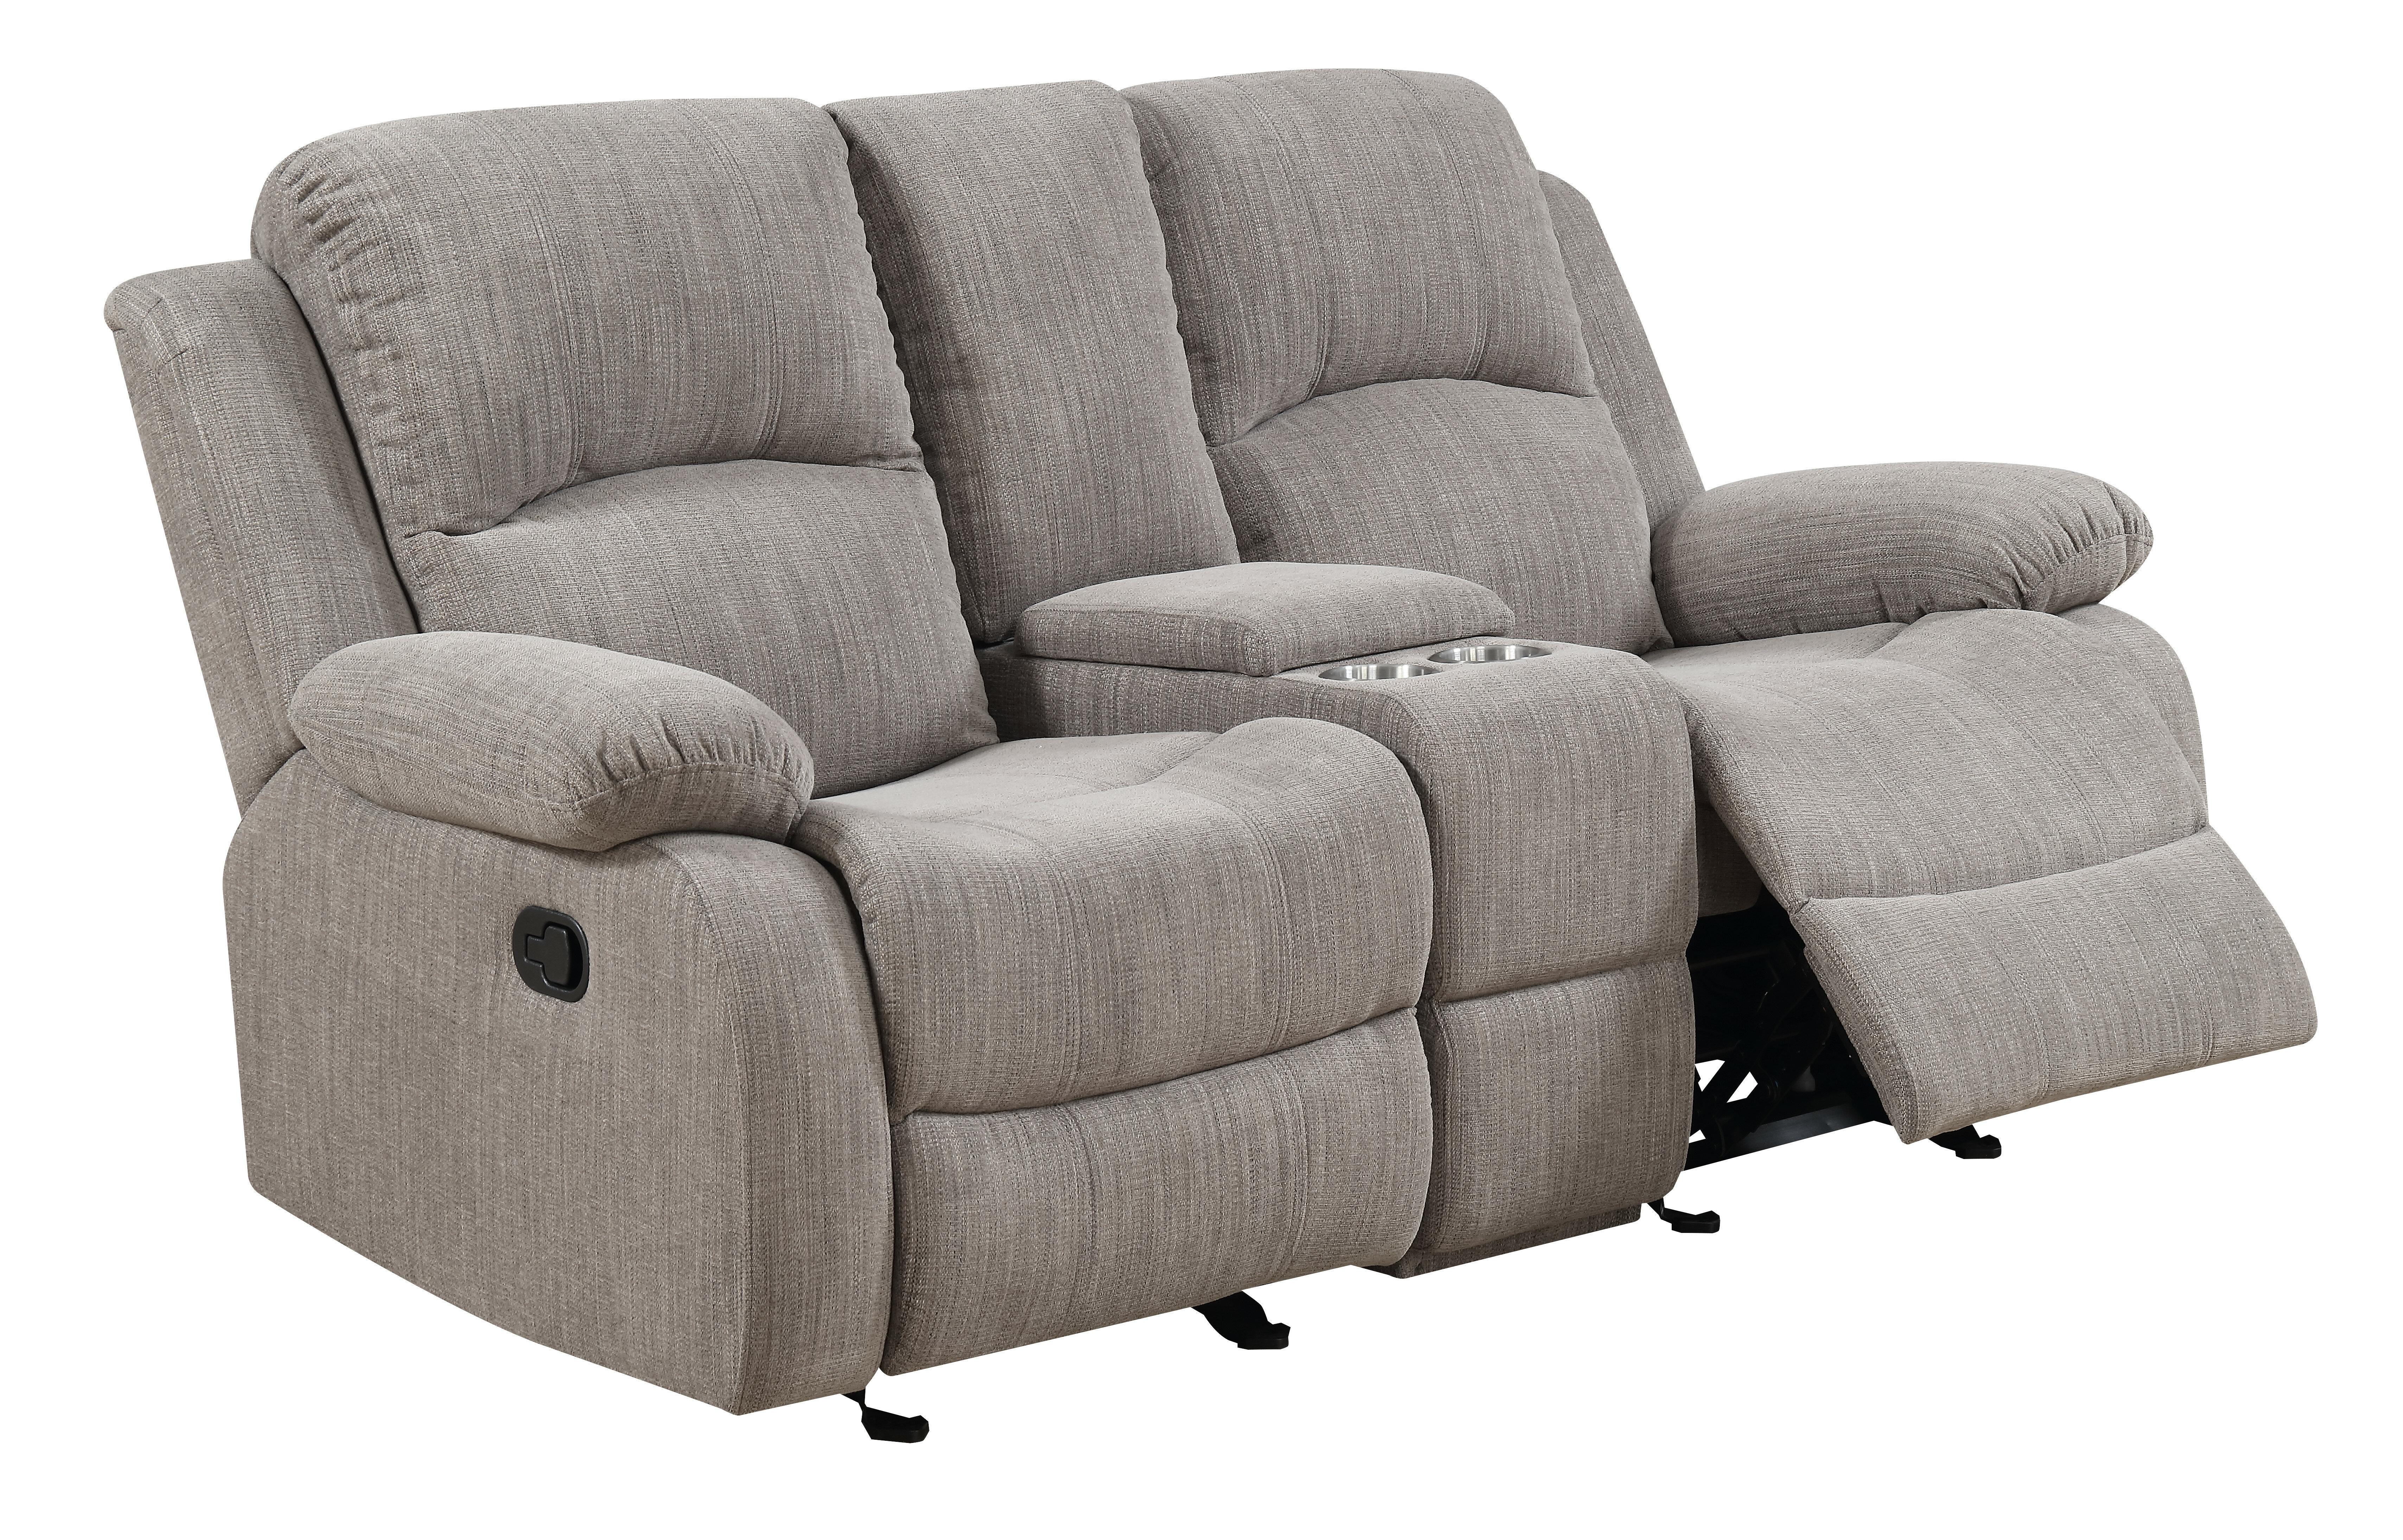 Super Berrios Reclining Loveseat Pdpeps Interior Chair Design Pdpepsorg